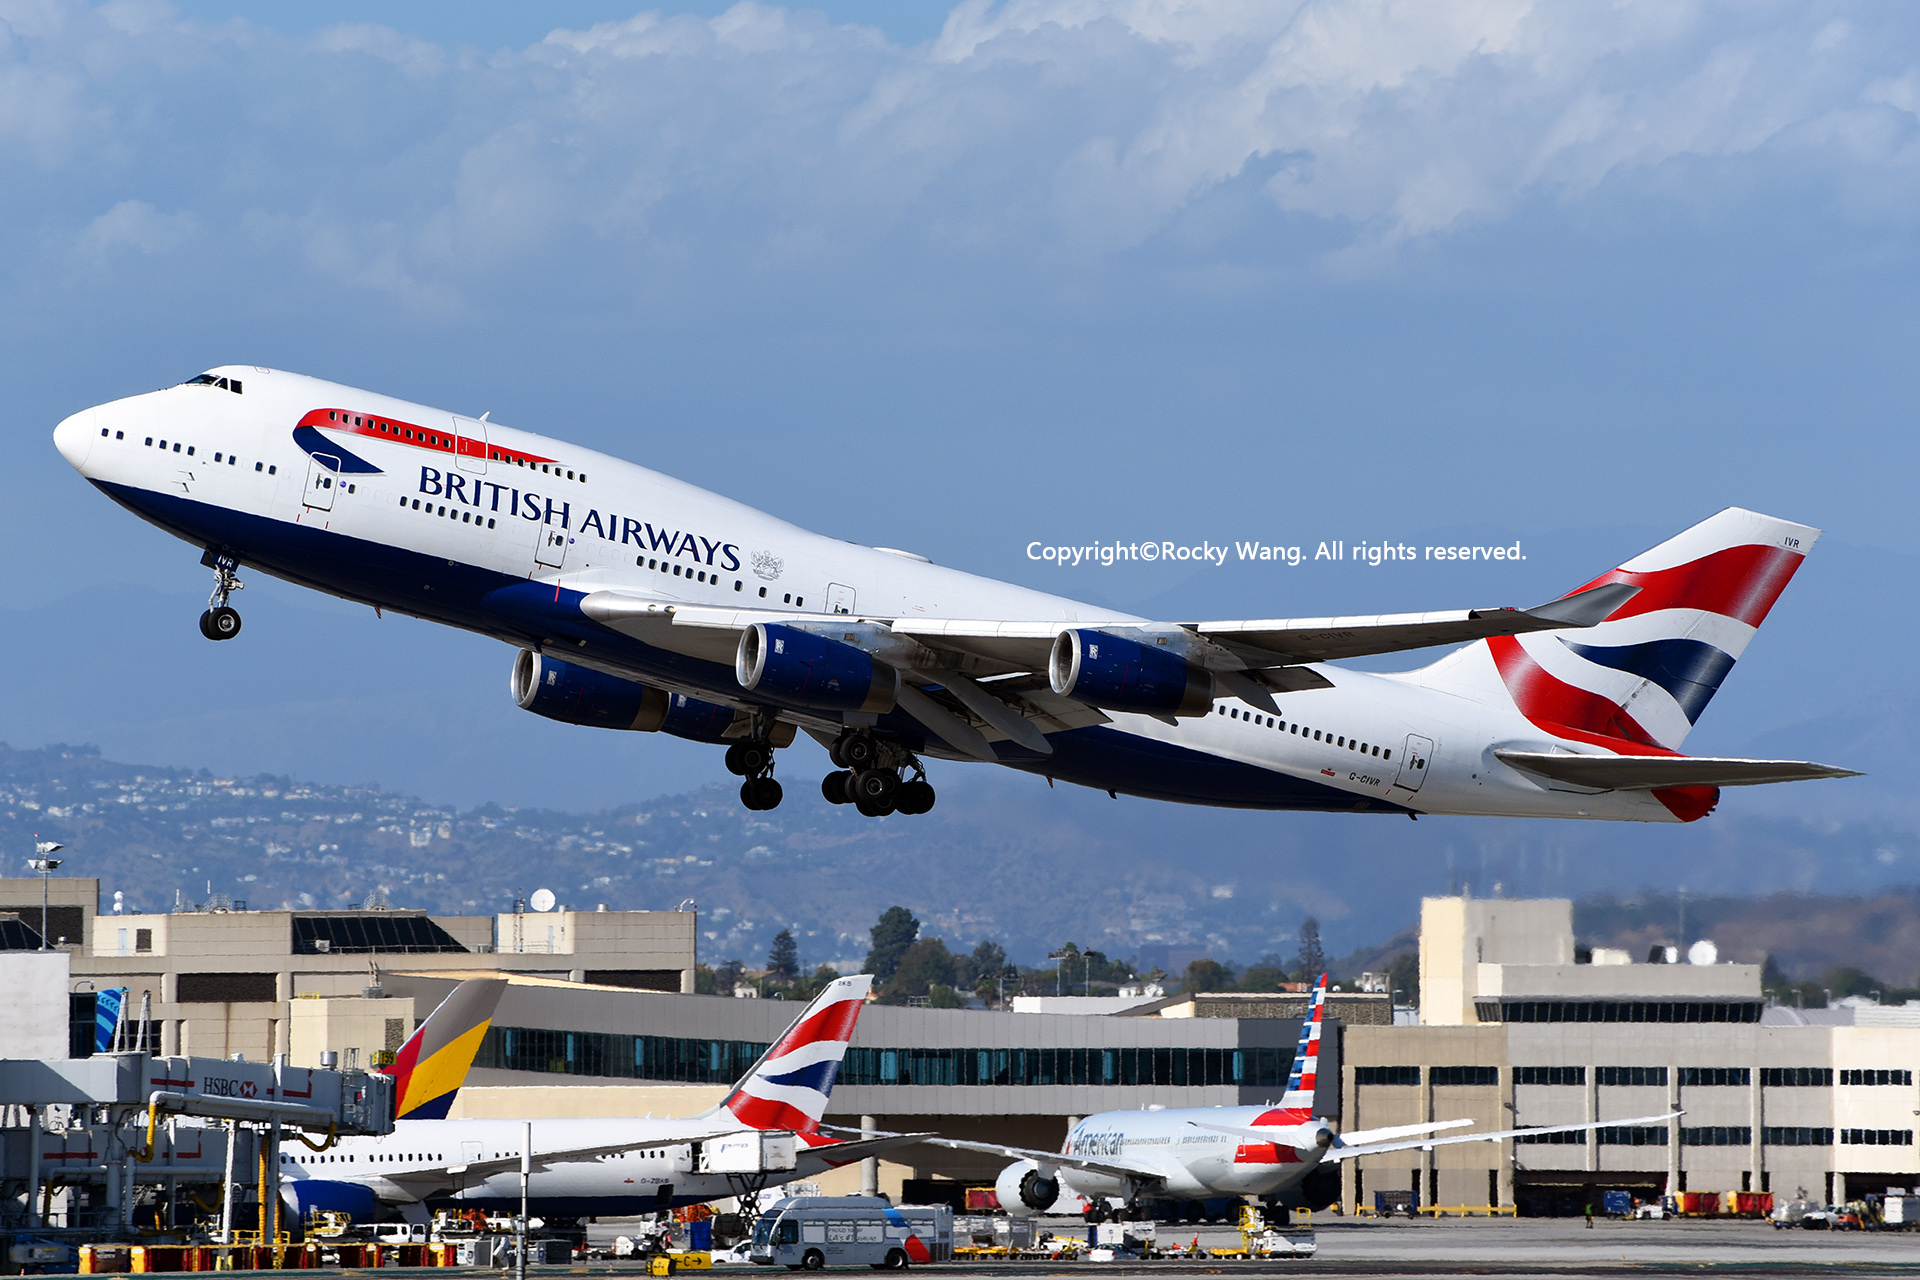 Re:[原创]随便来一组 不凑30图了 BOEING 747-436 G-CIVR Los Angeles Int'l Airport